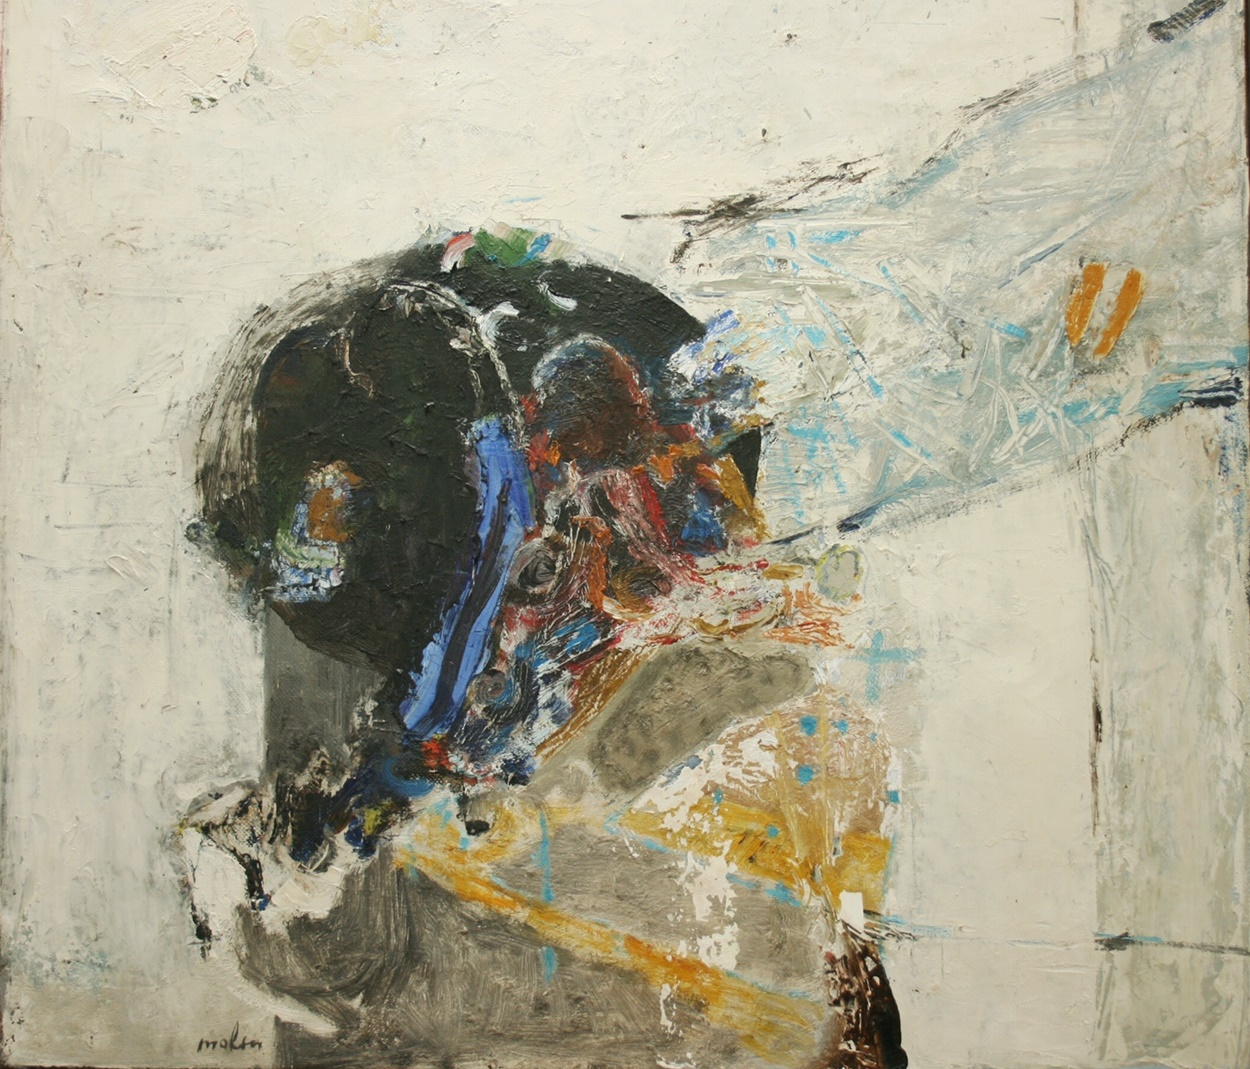 Gevraagd: vroege abstracte werken Lei Molin (1927-1990)